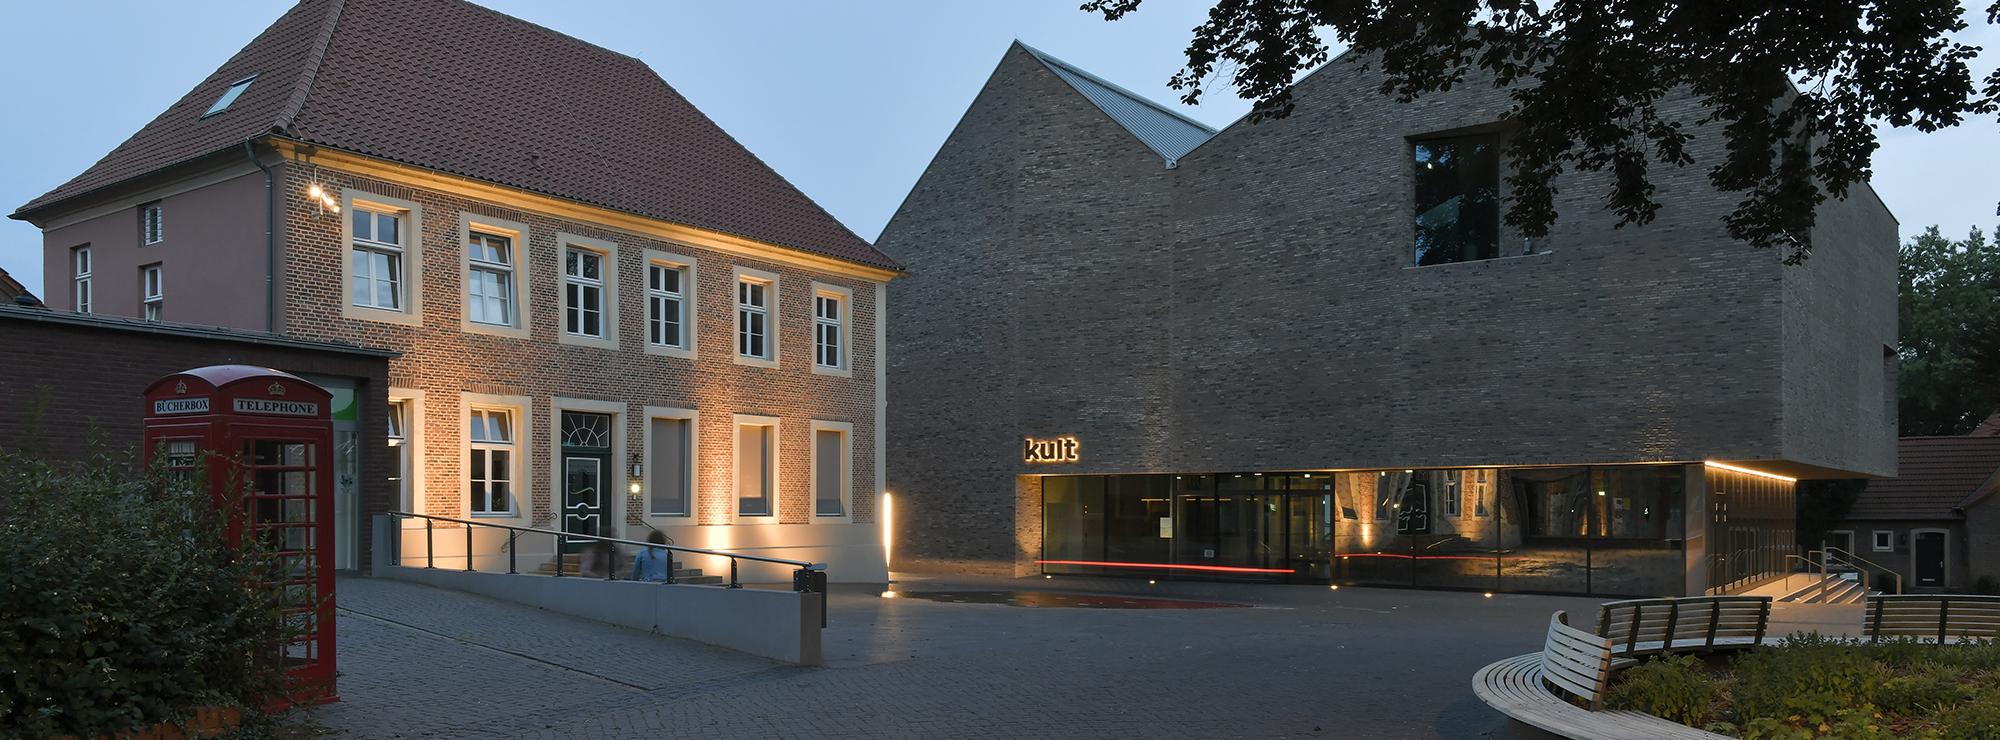 Vreden_Kulturpromenade_Umgestaltung_Freiraum_Pesch